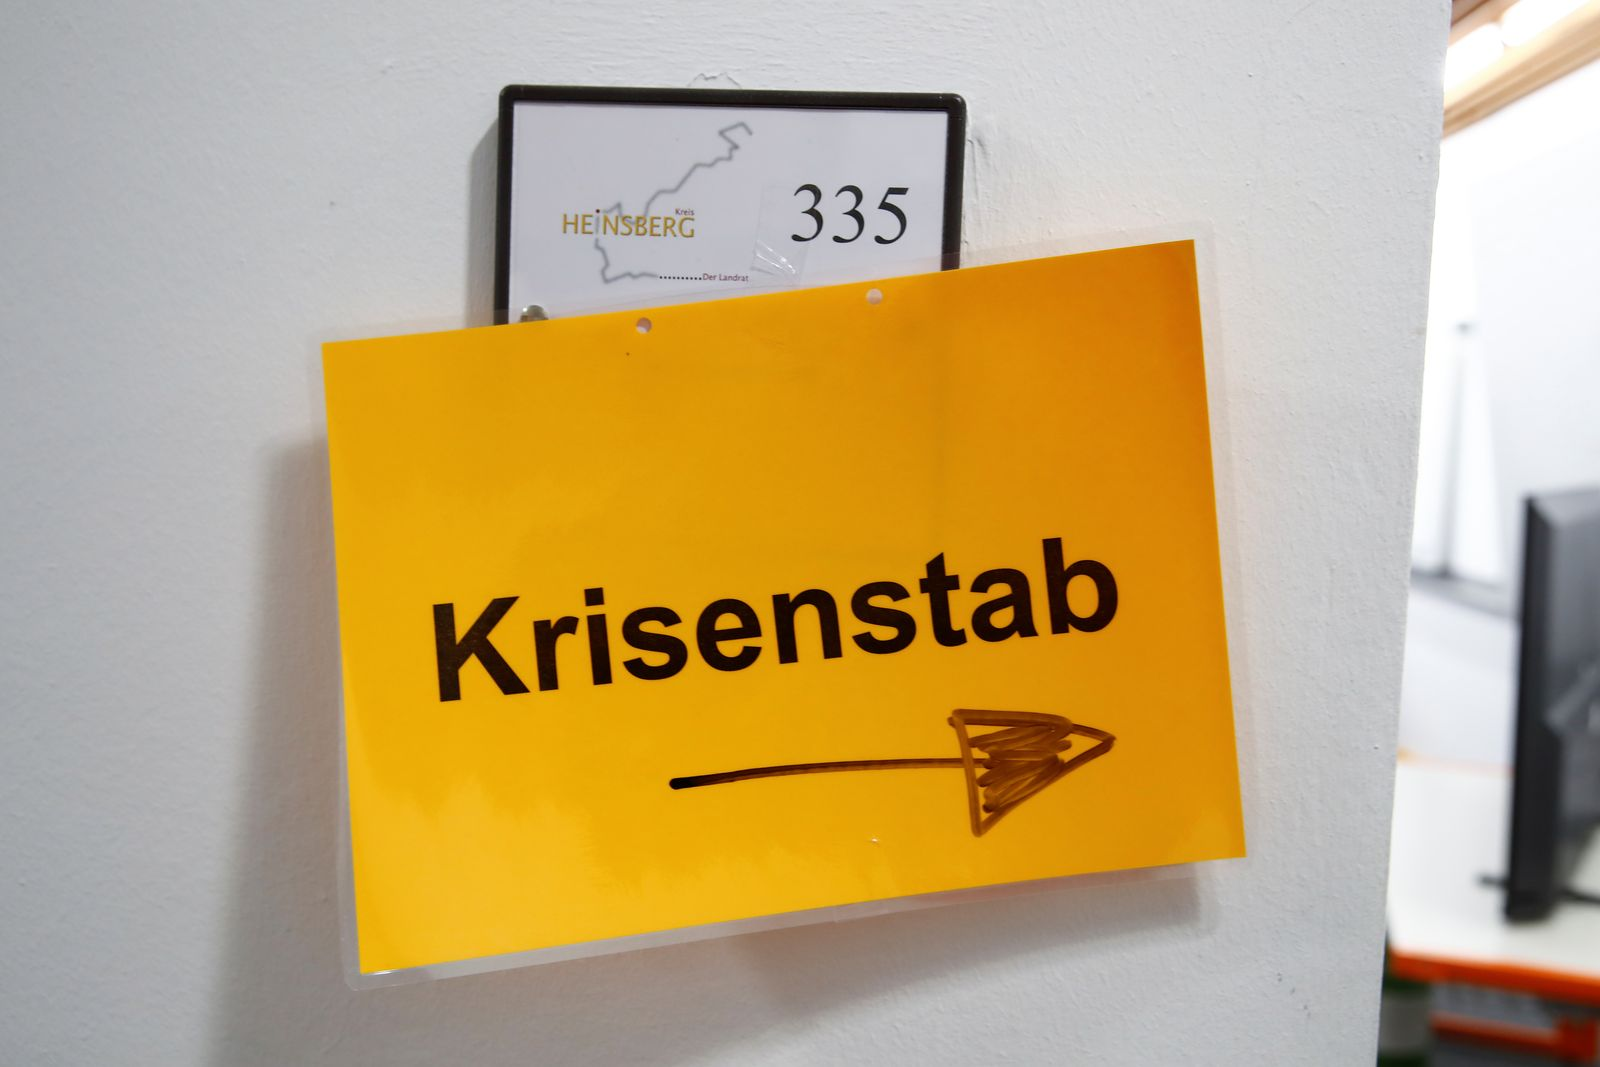 Coronavirus crisis management group in the western German district of Heinsberg near Aachen